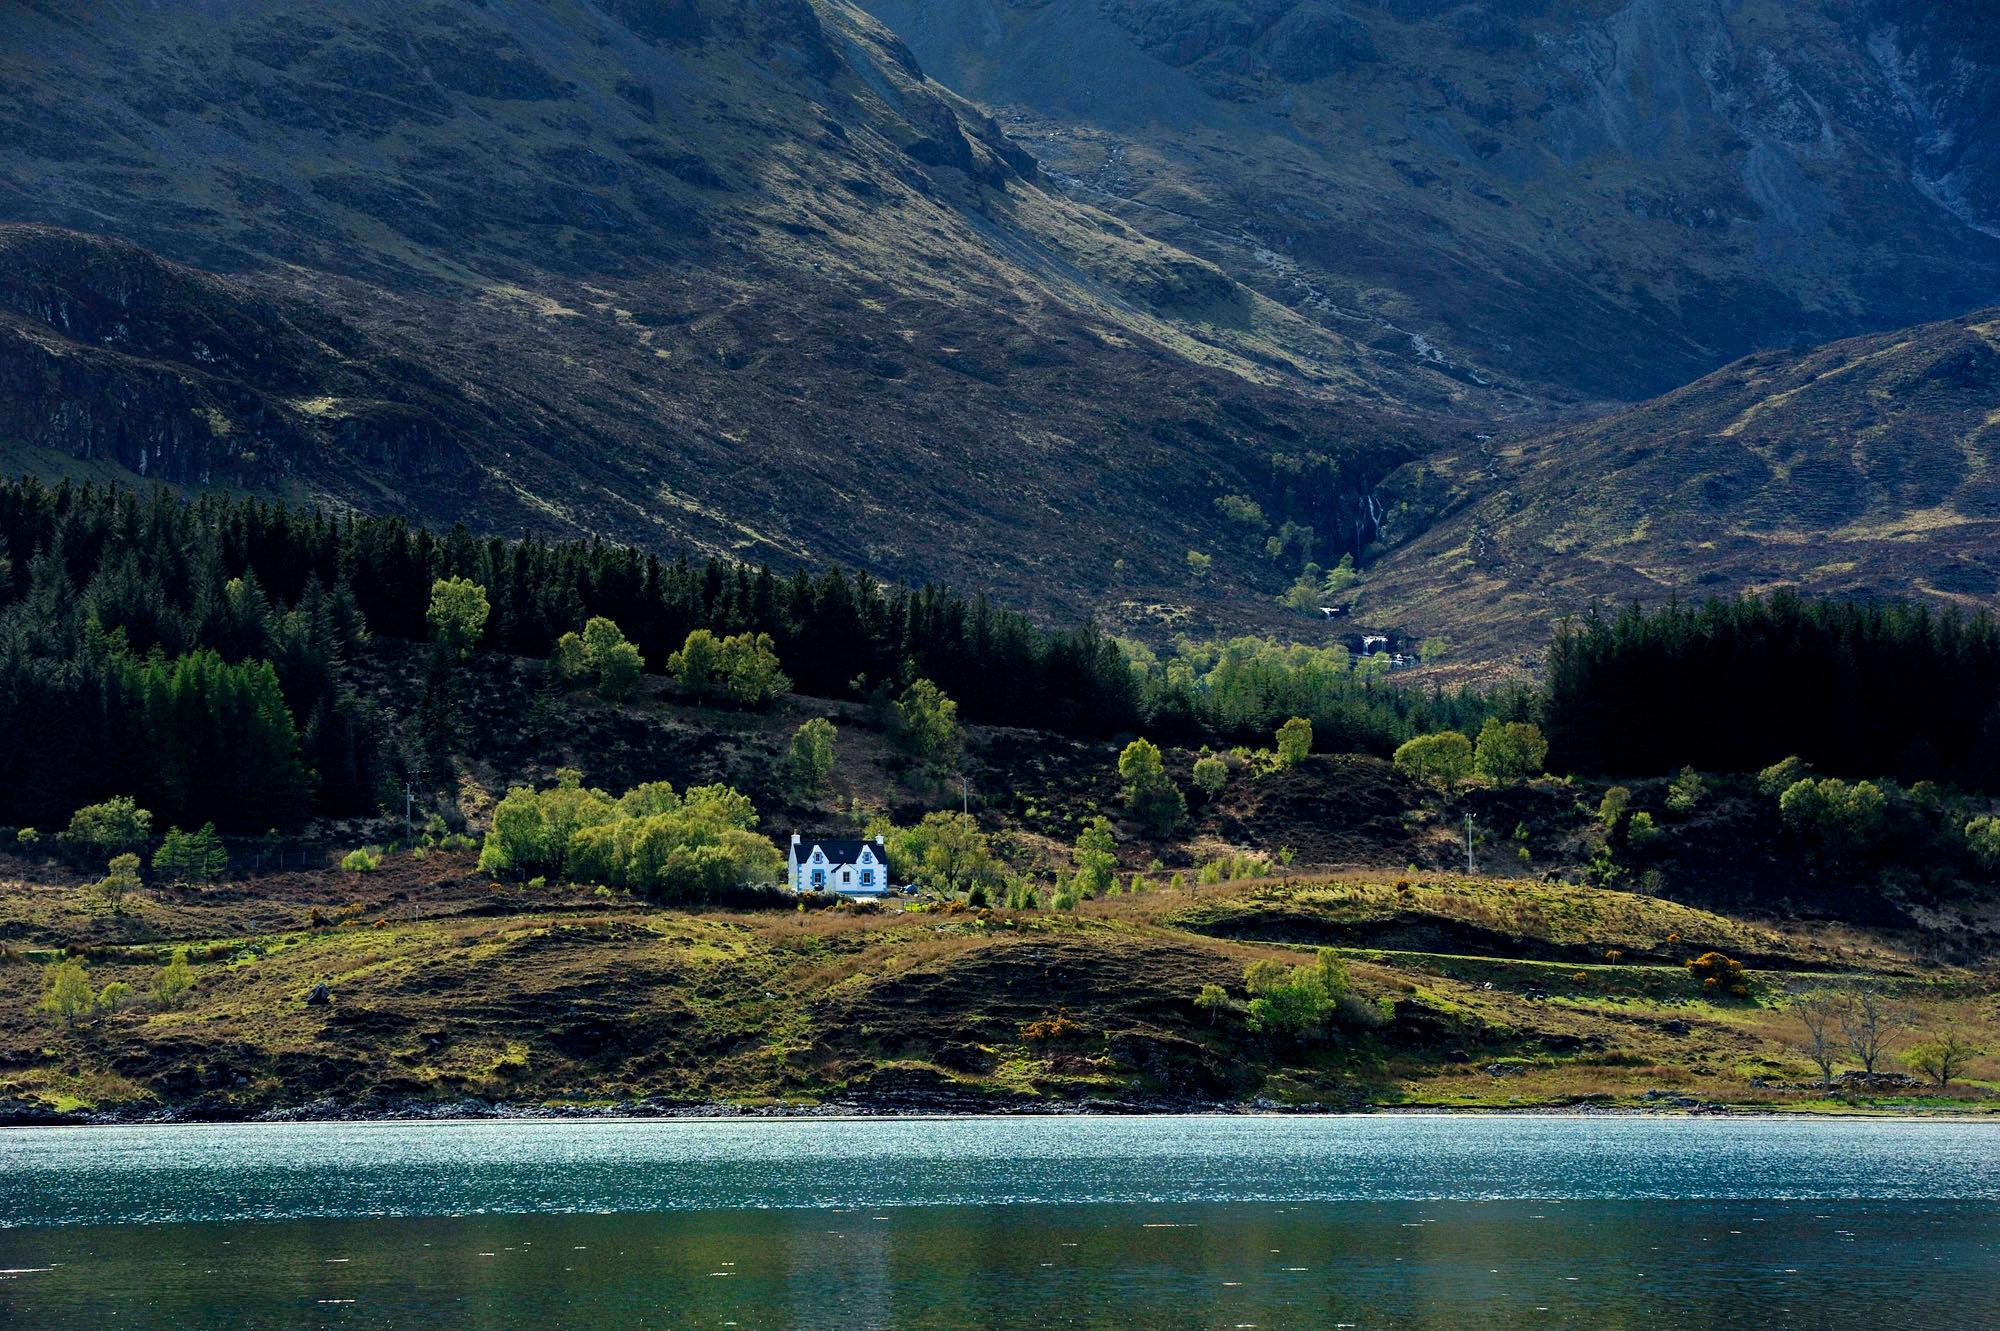 La maison de Loch Slapin, île de Skye